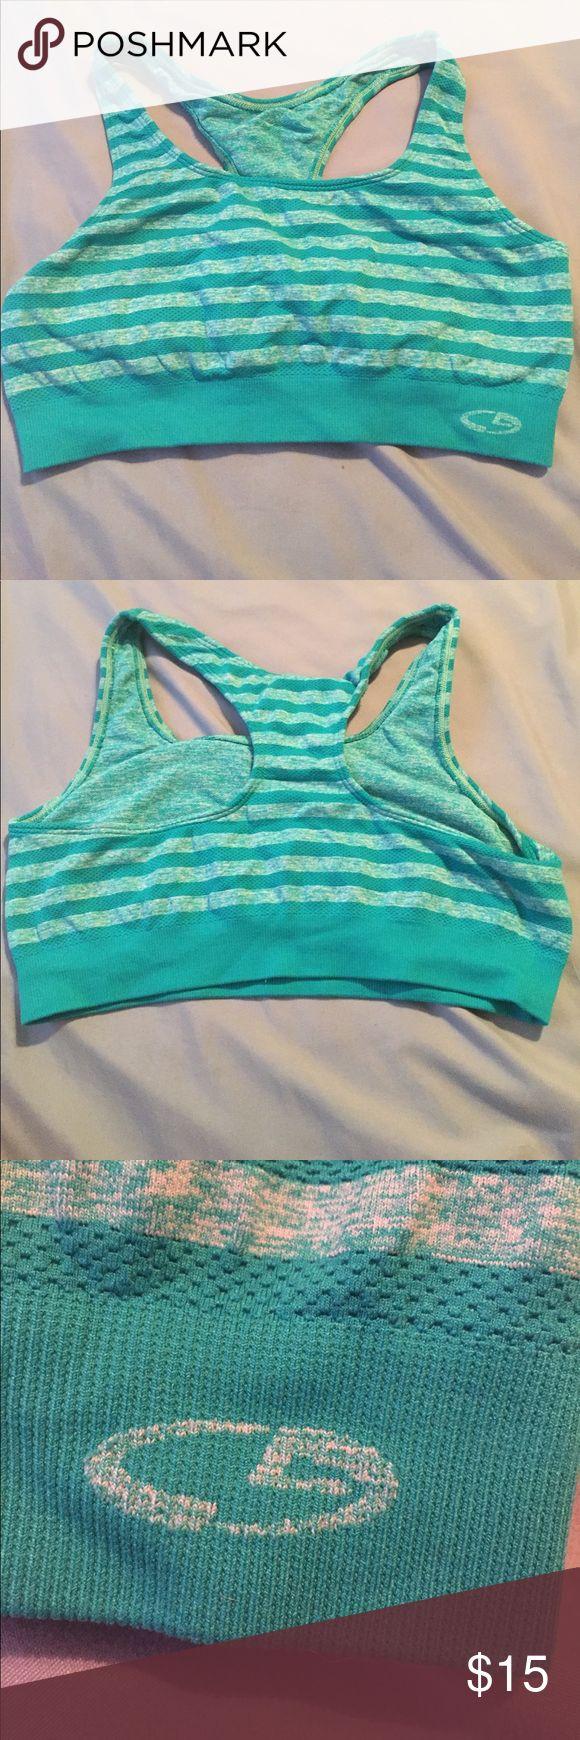 Green striped sports bra Green striped sports bra. Barely worn. Champion Intimates & Sleepwear Bras